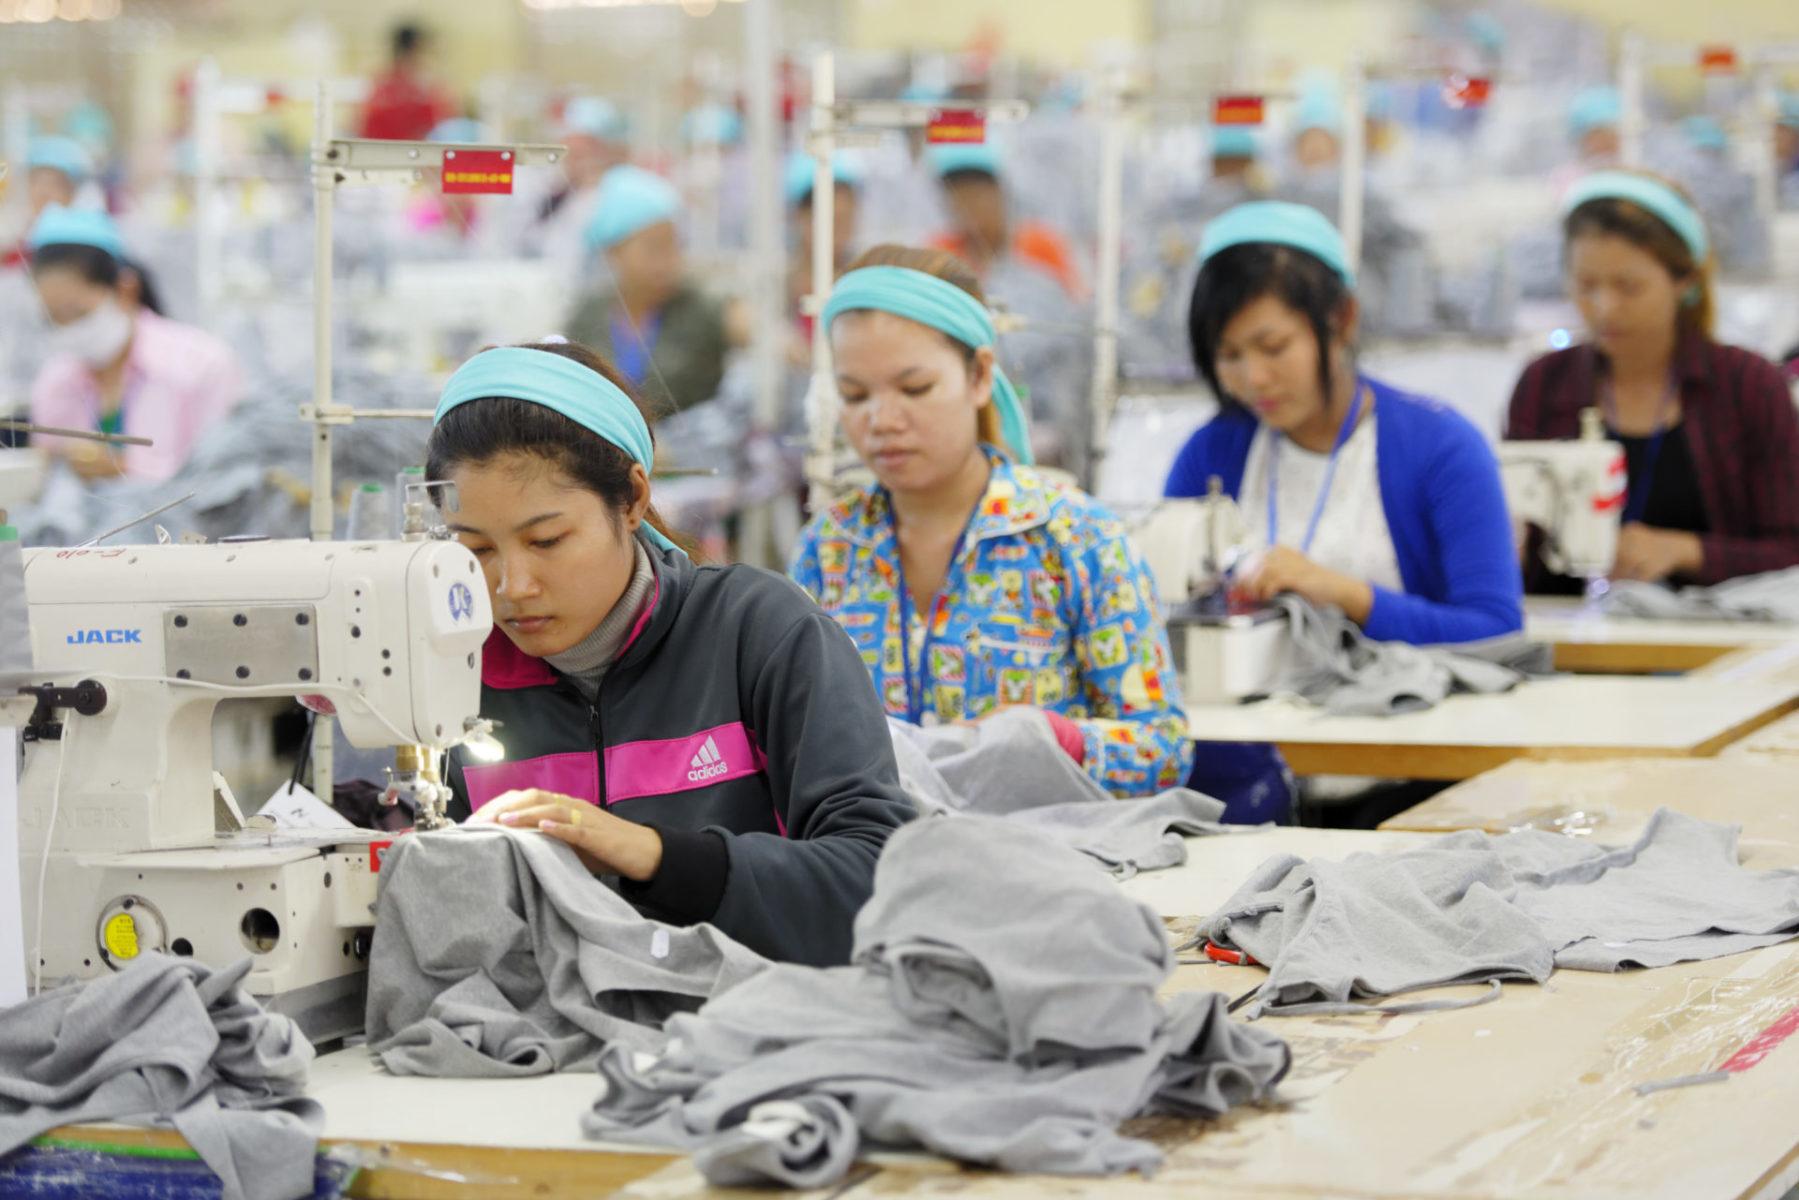 Kambodscha Textilarbeiter*innen